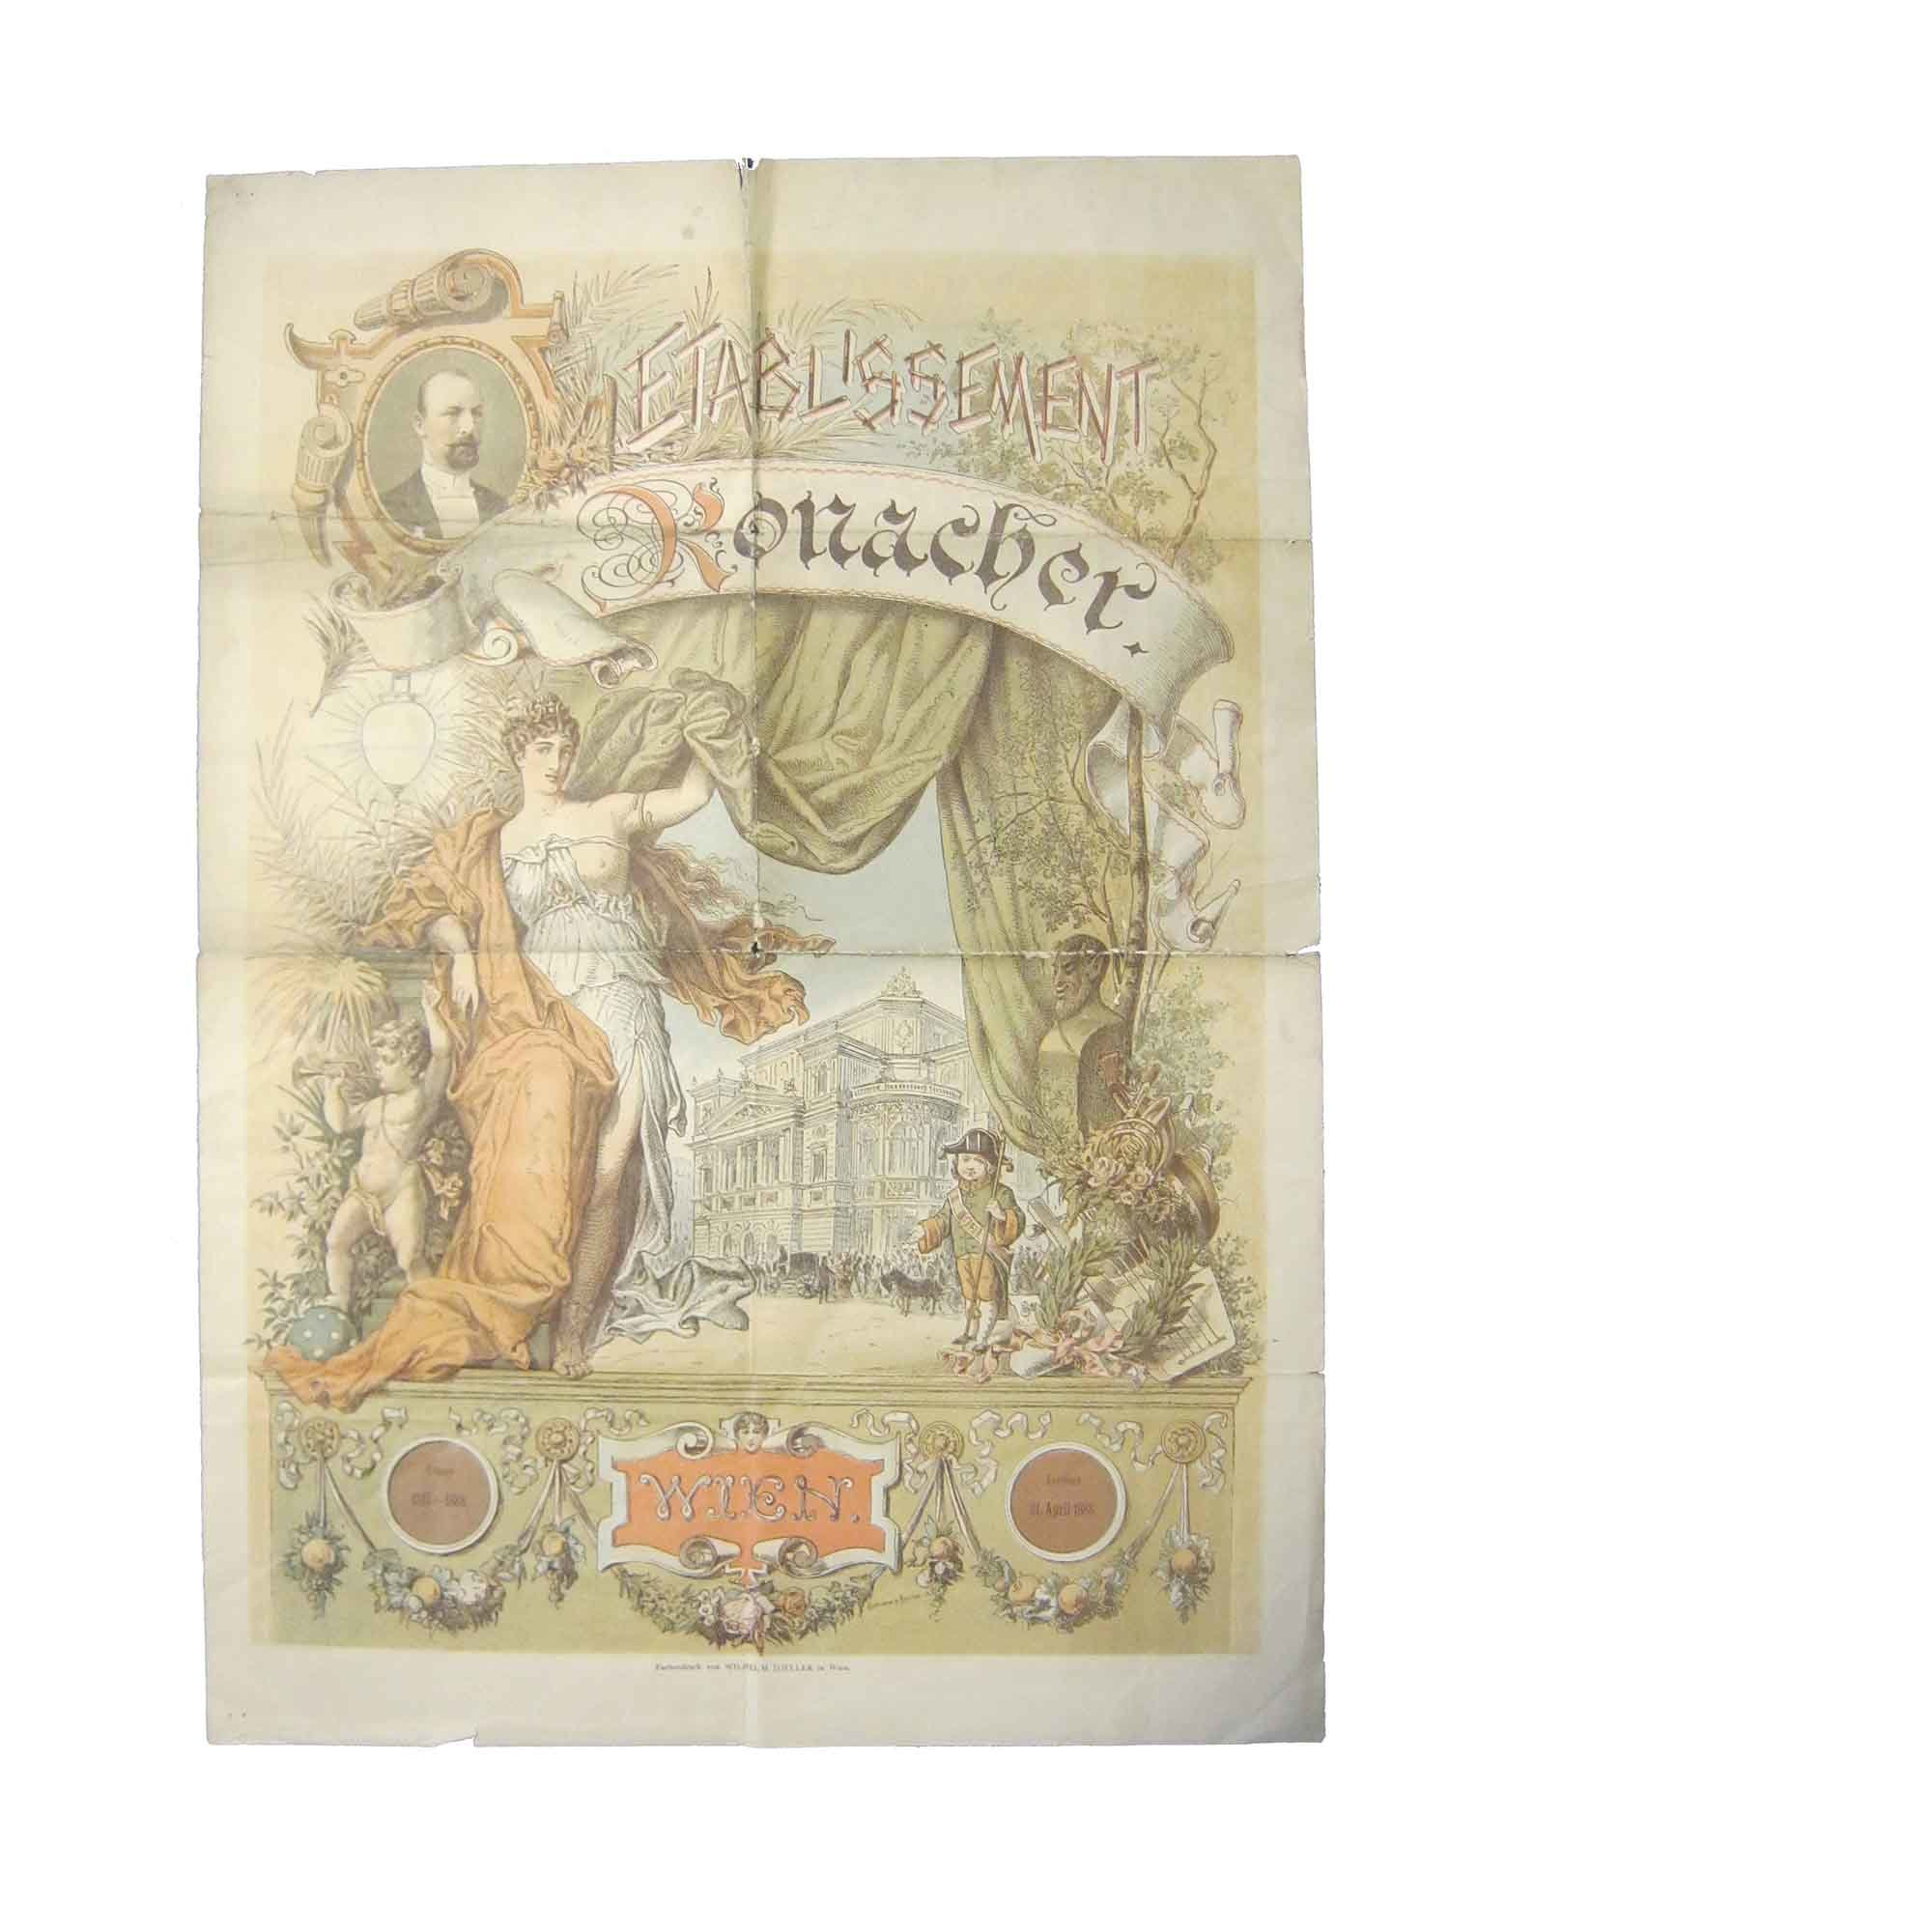 5458 Ronacher Plakat 1888 r N